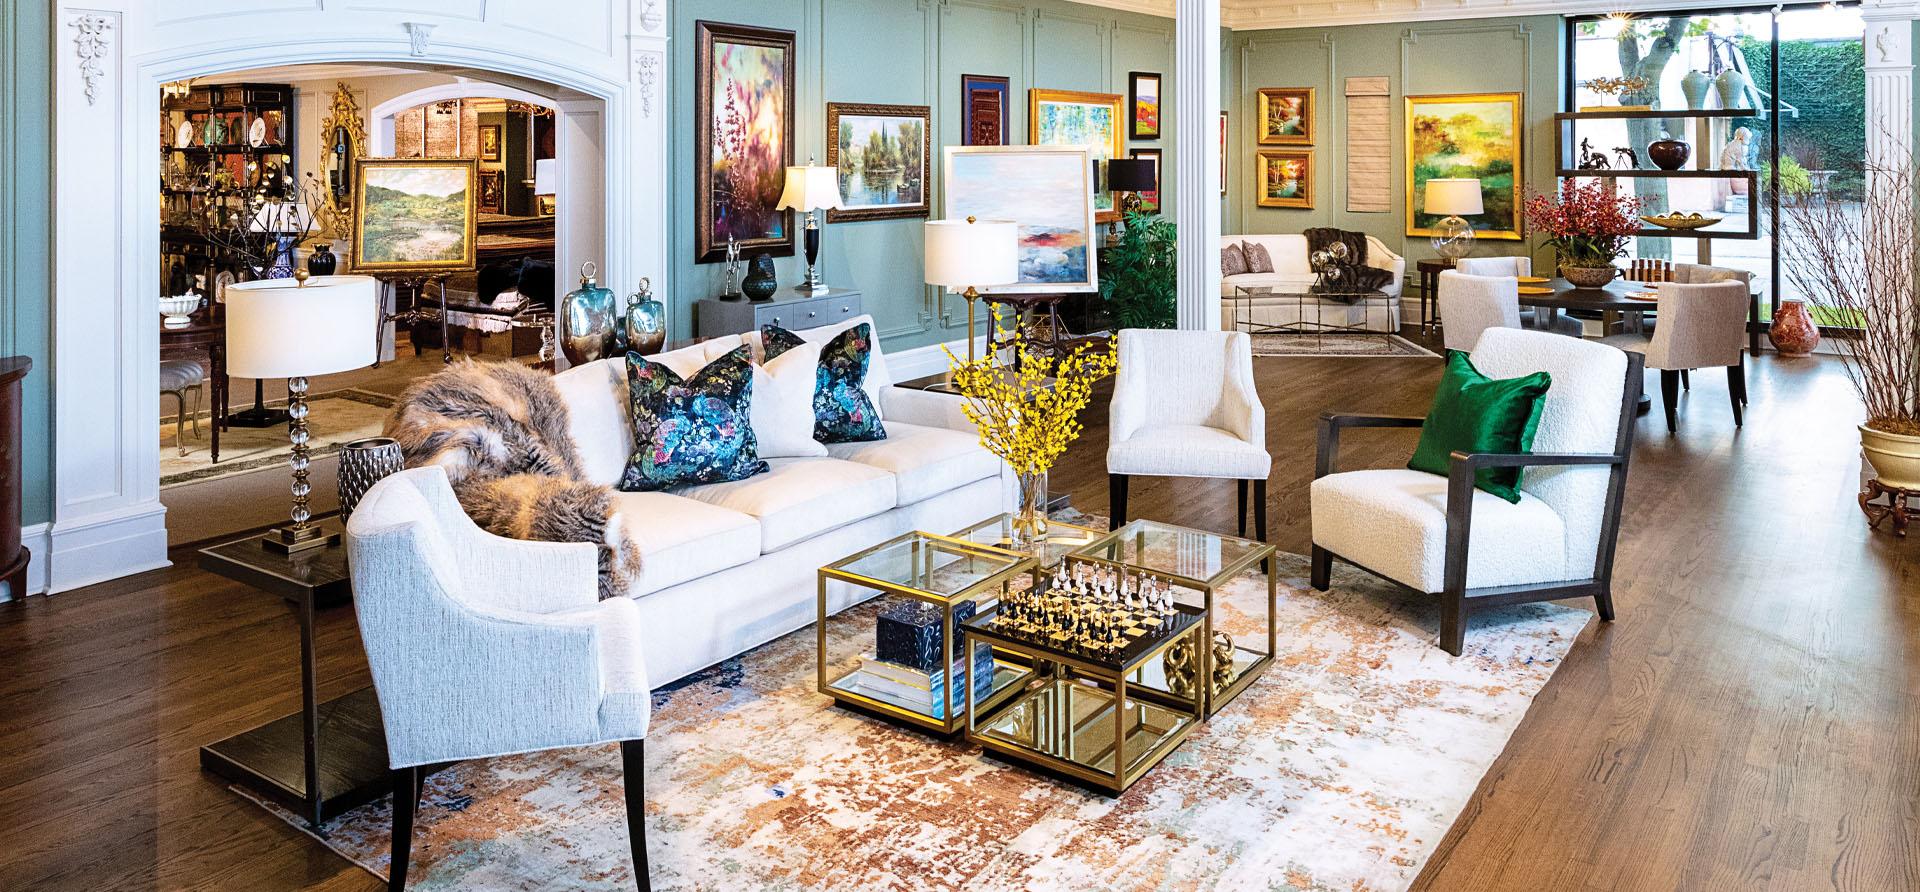 Birmingham Design Studio Furniture Store and Showroom in Birmingham Michigan